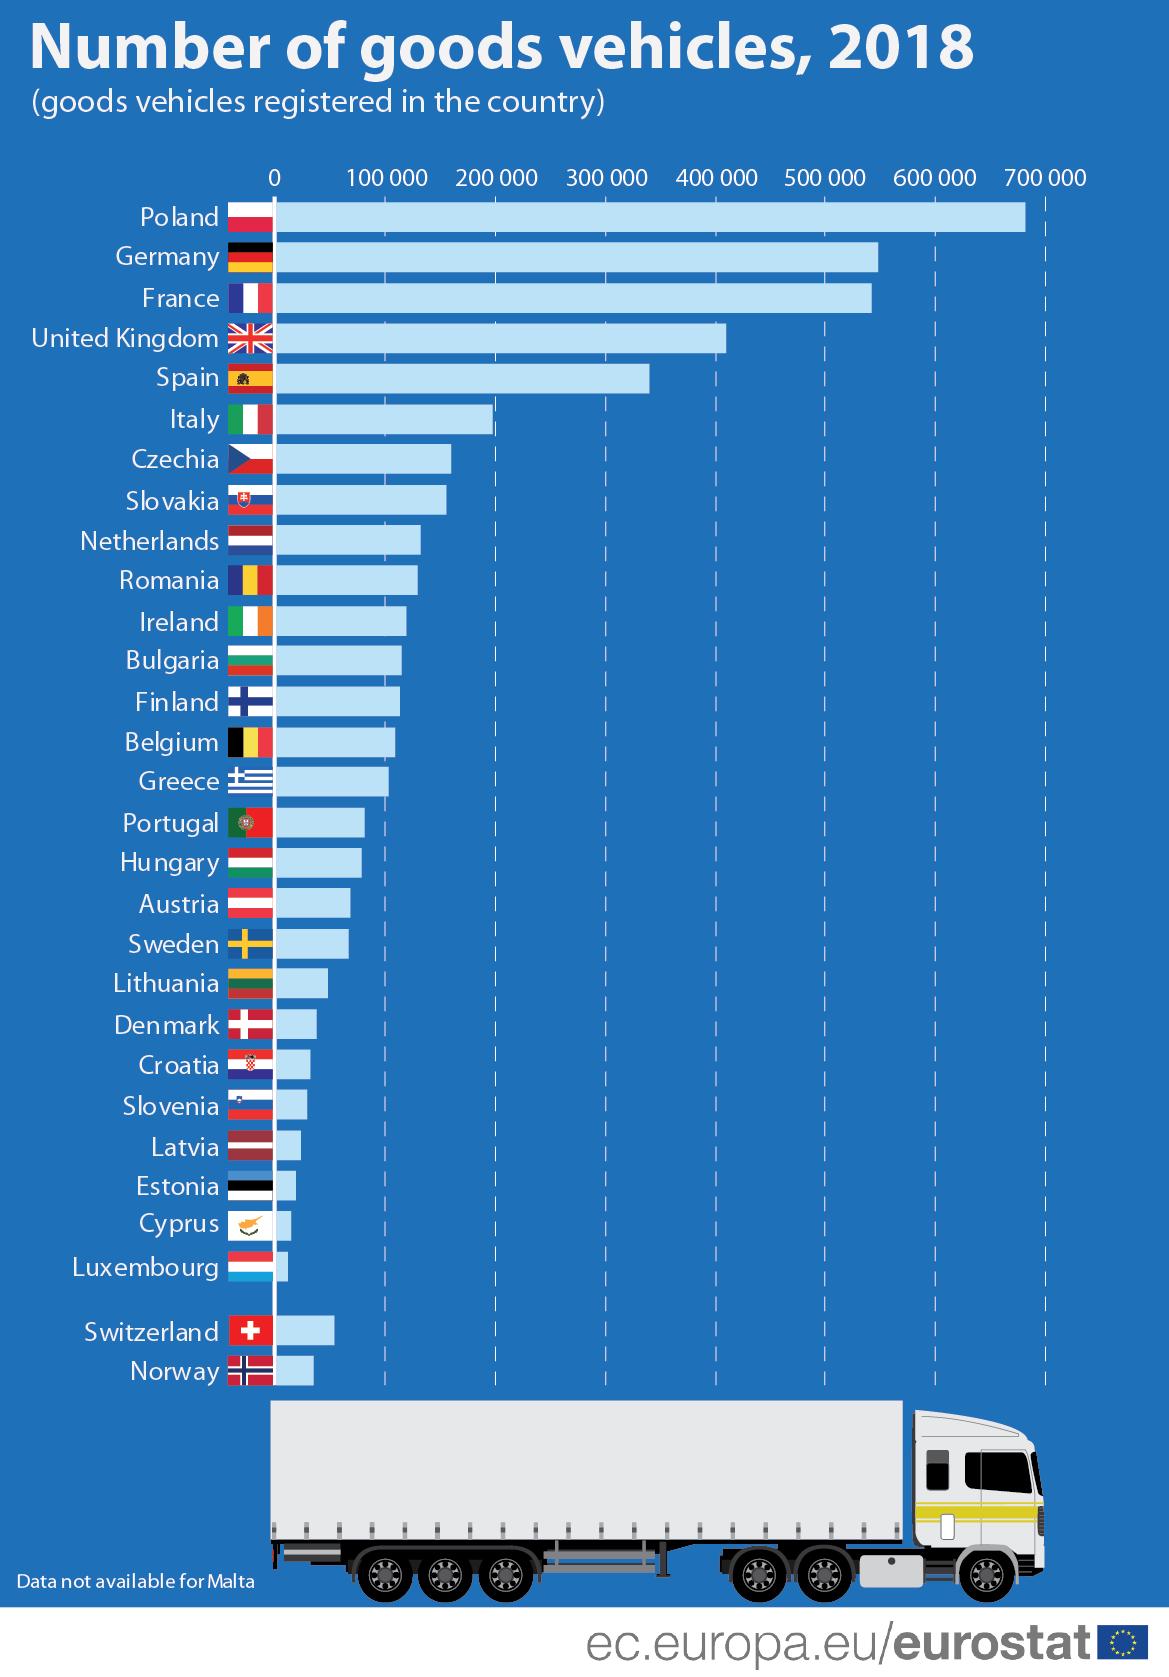 Bar chart: Number of goods vehicles (trucks) registered in each EU Member State or EFTA country, 2018